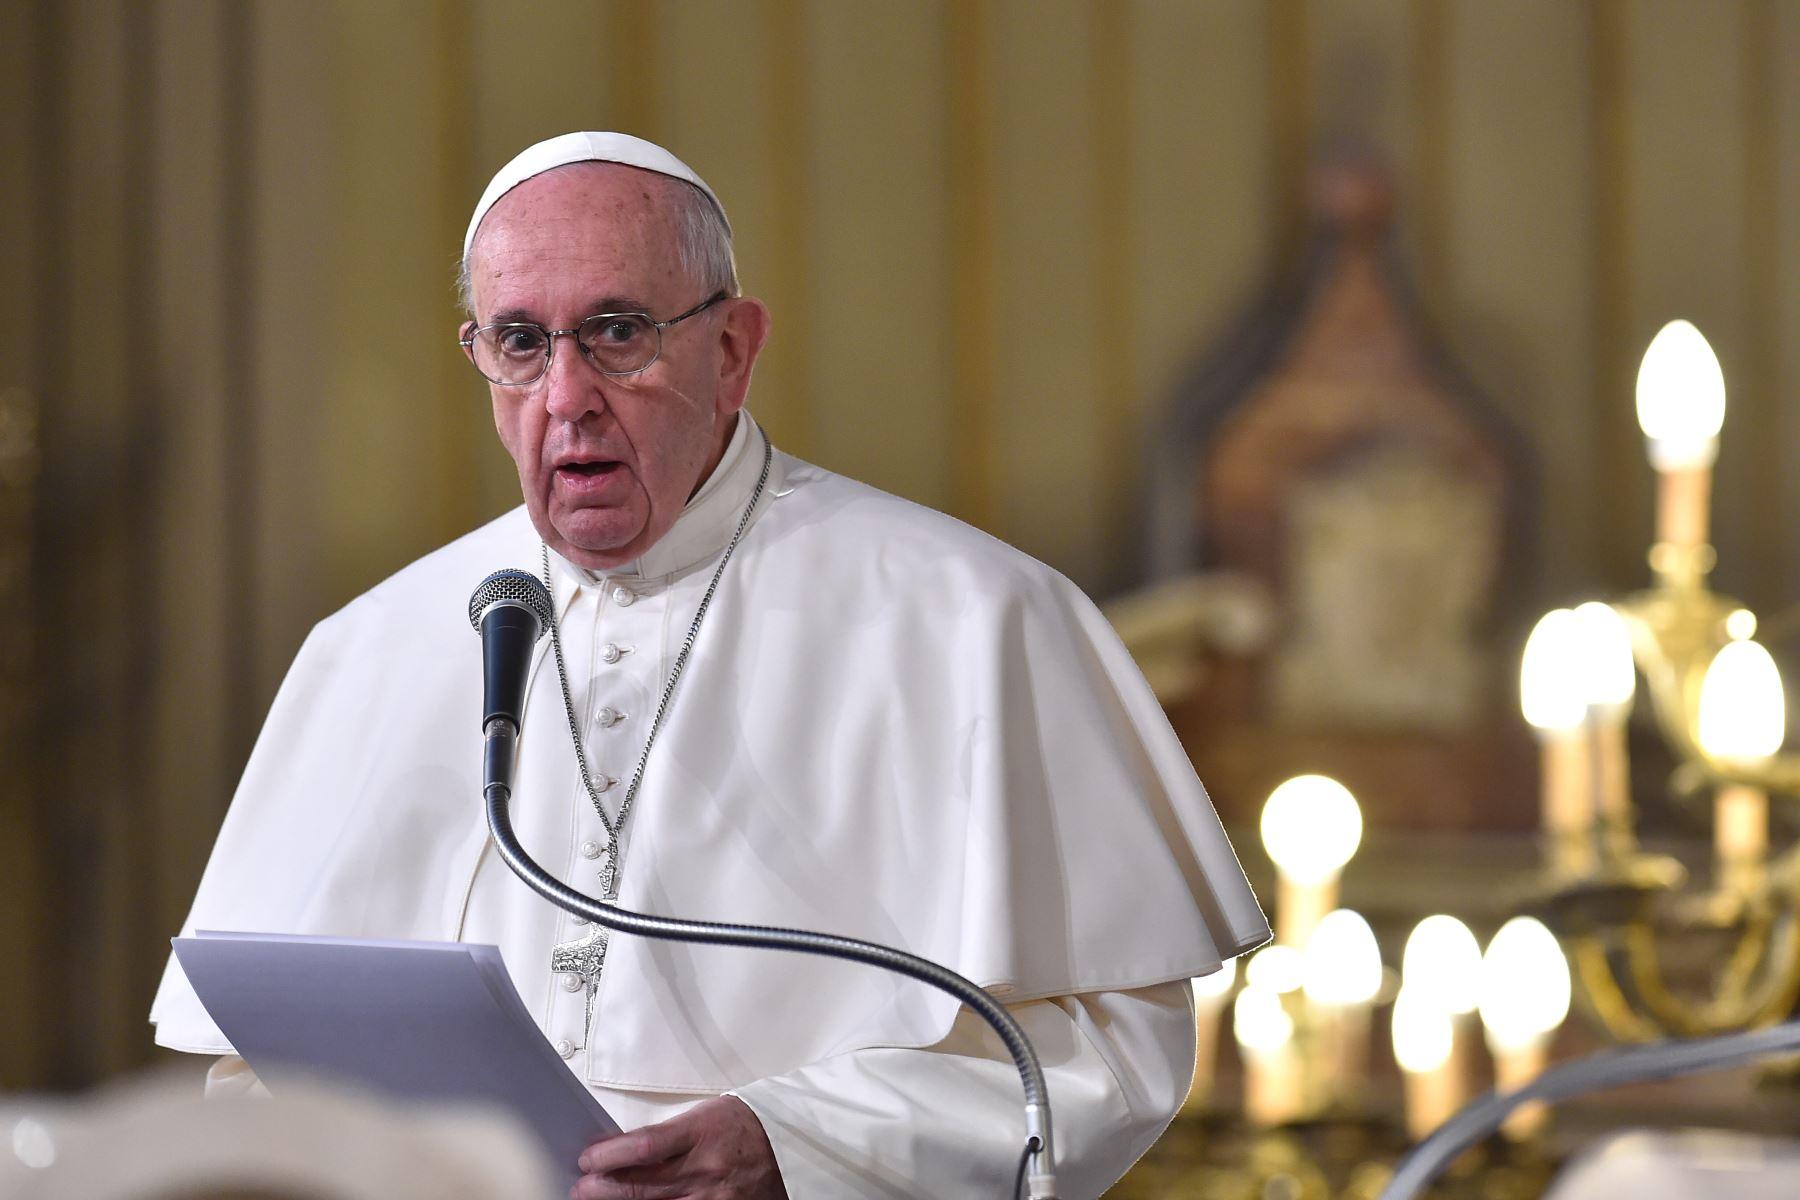 Union Matrimonio Catolico : Papa defiende con firmeza el matrimonio católico y condena